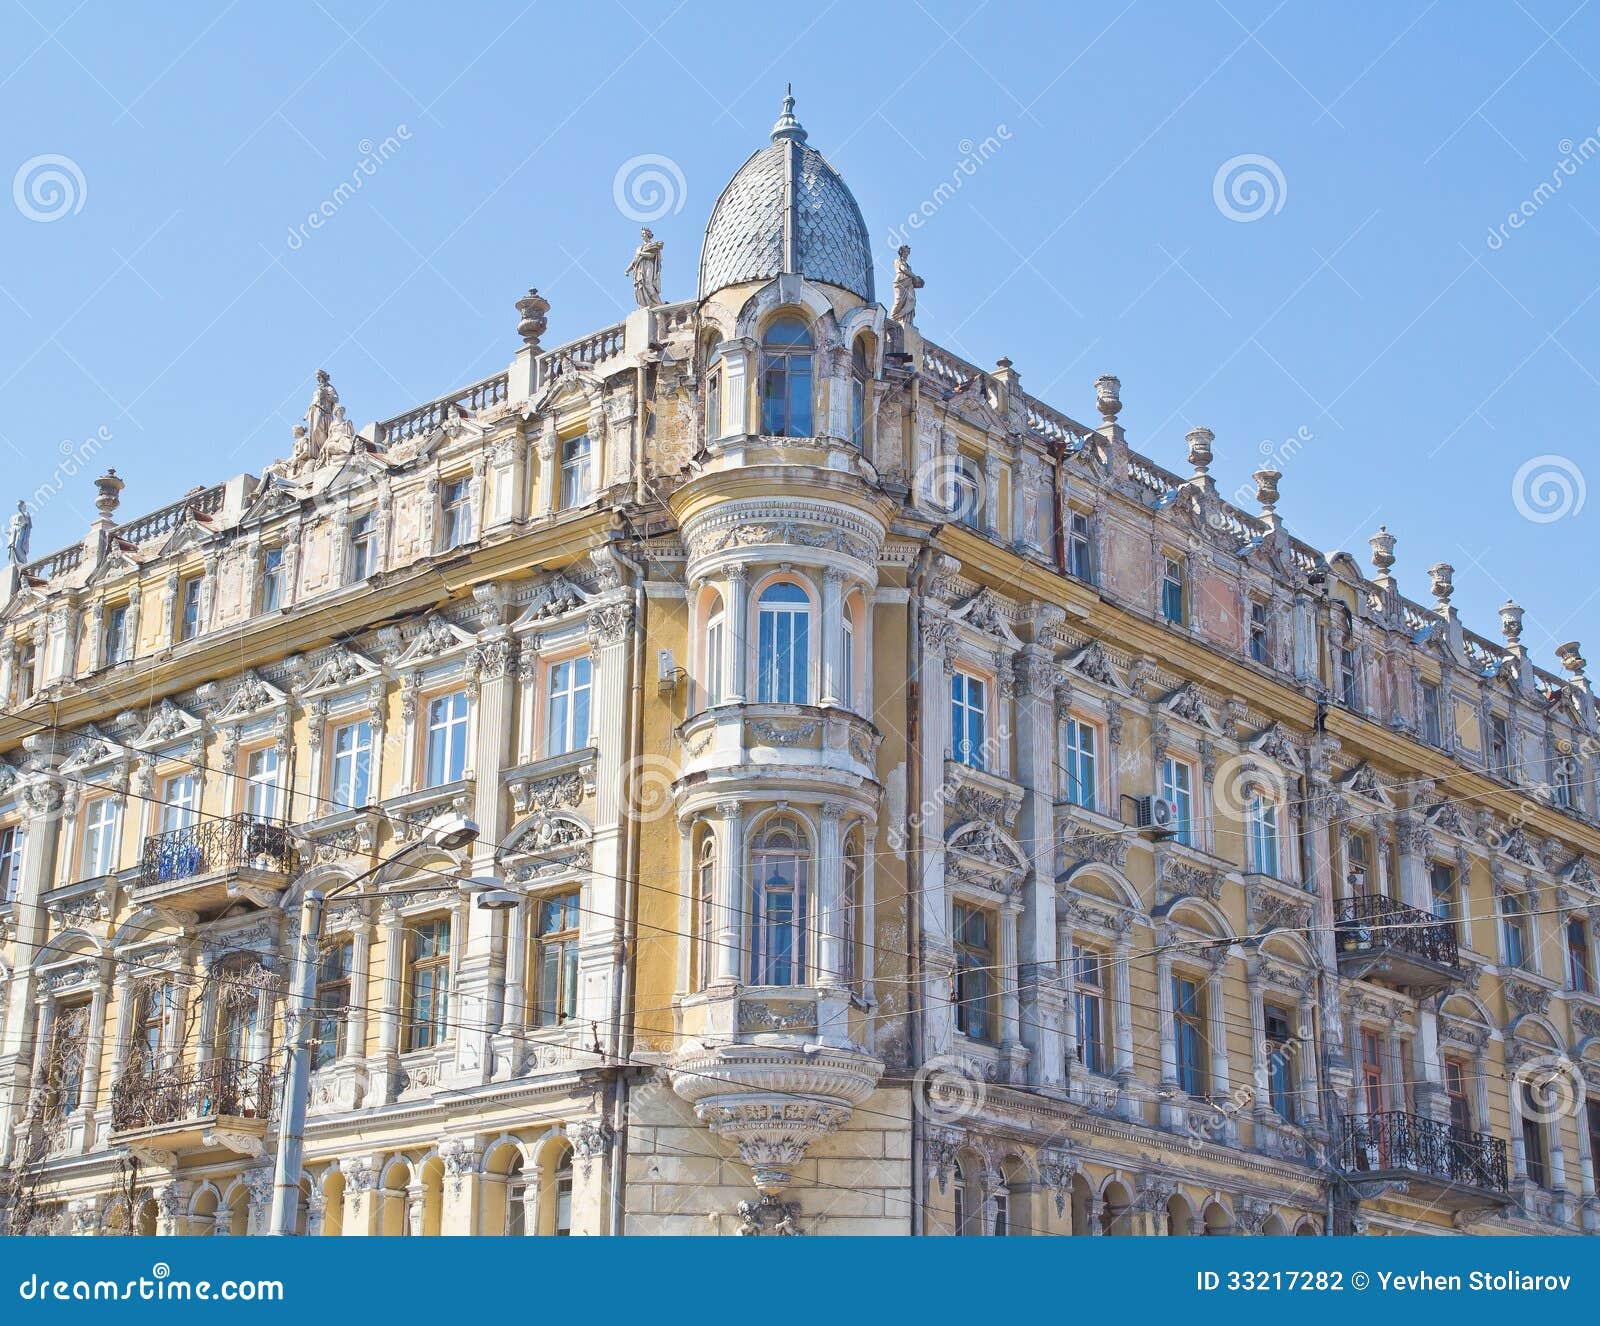 Facade Of Antique Building In Odessa Stock Photo - Image ...